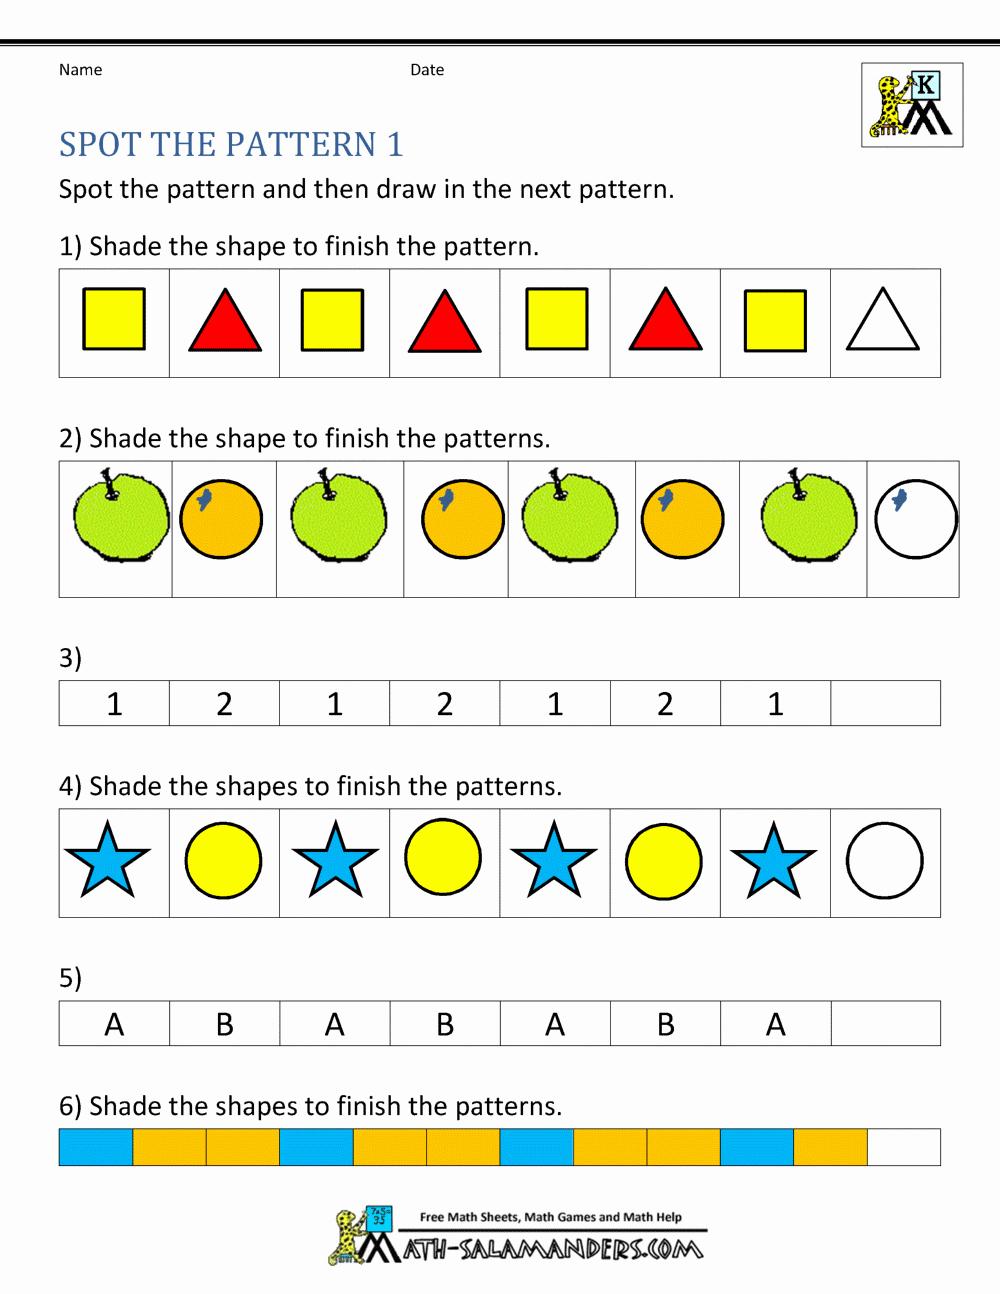 Sequence Worksheets for Kindergarten Best Of Sequencing Worksheets for Kindergarten